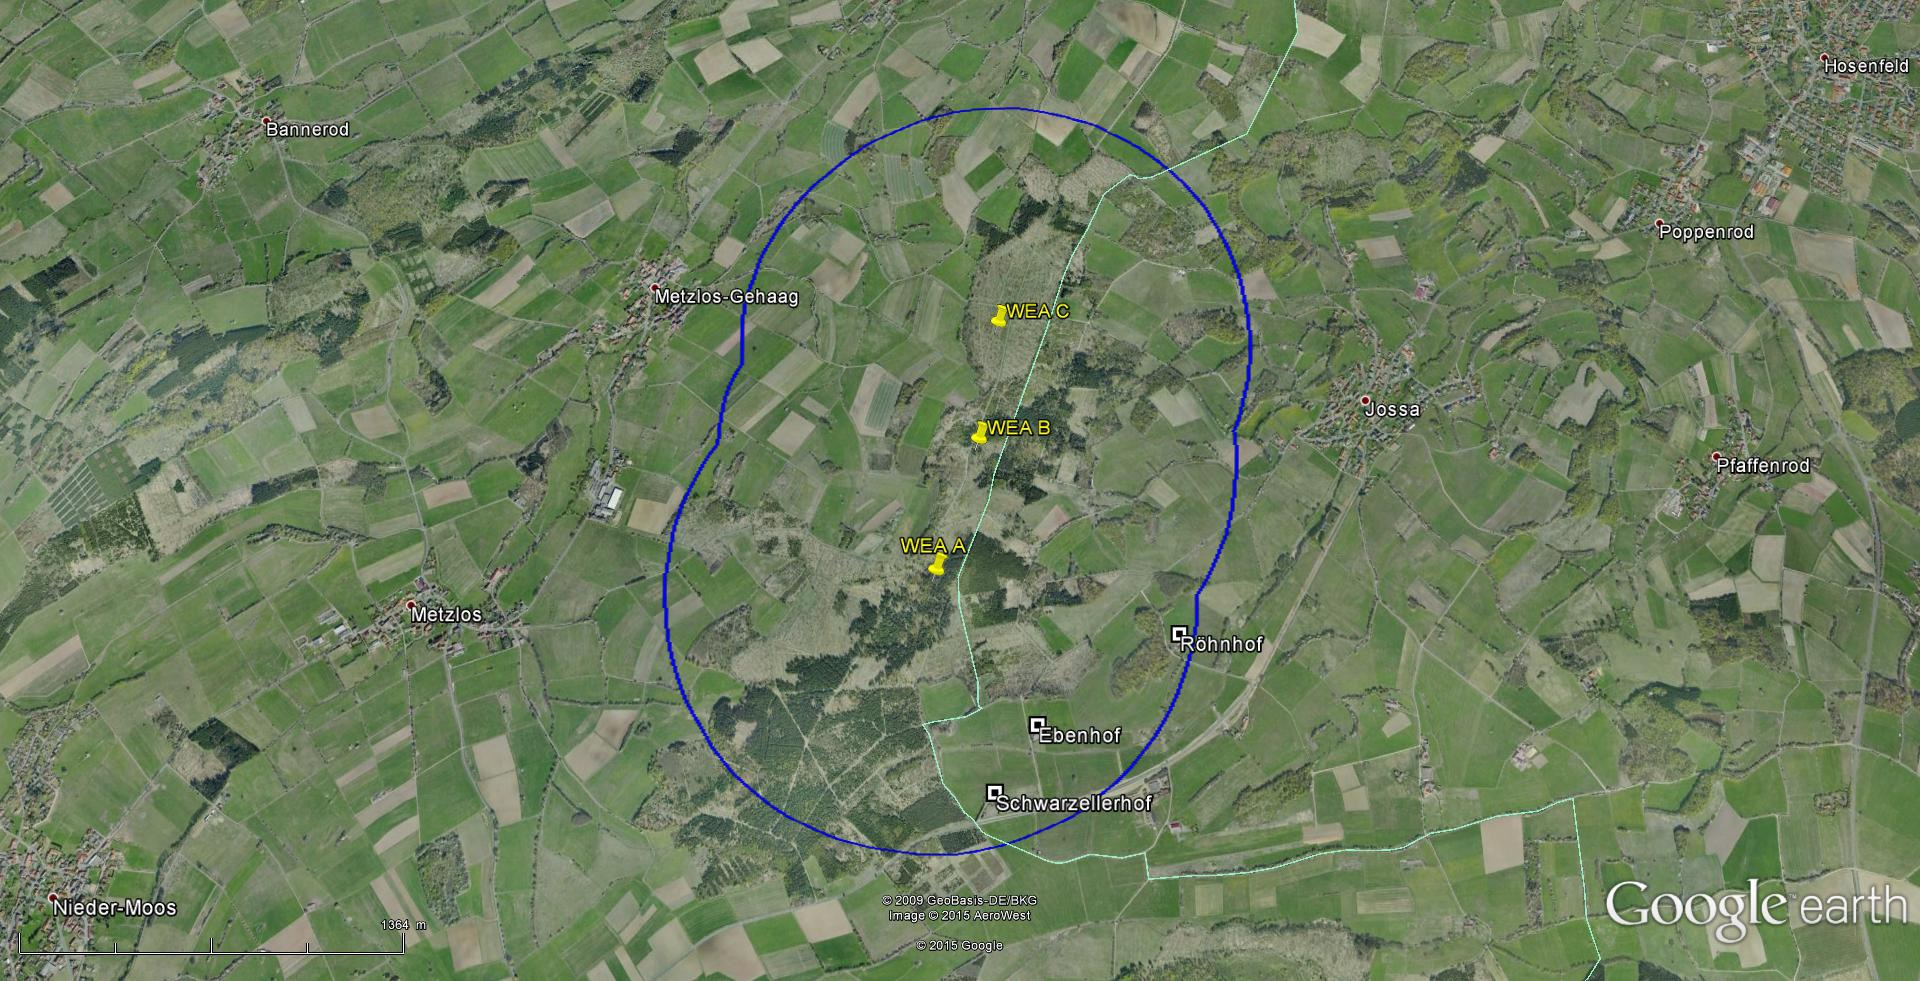 WKA Planung Werschbach - Quelle Karte: Google Earth